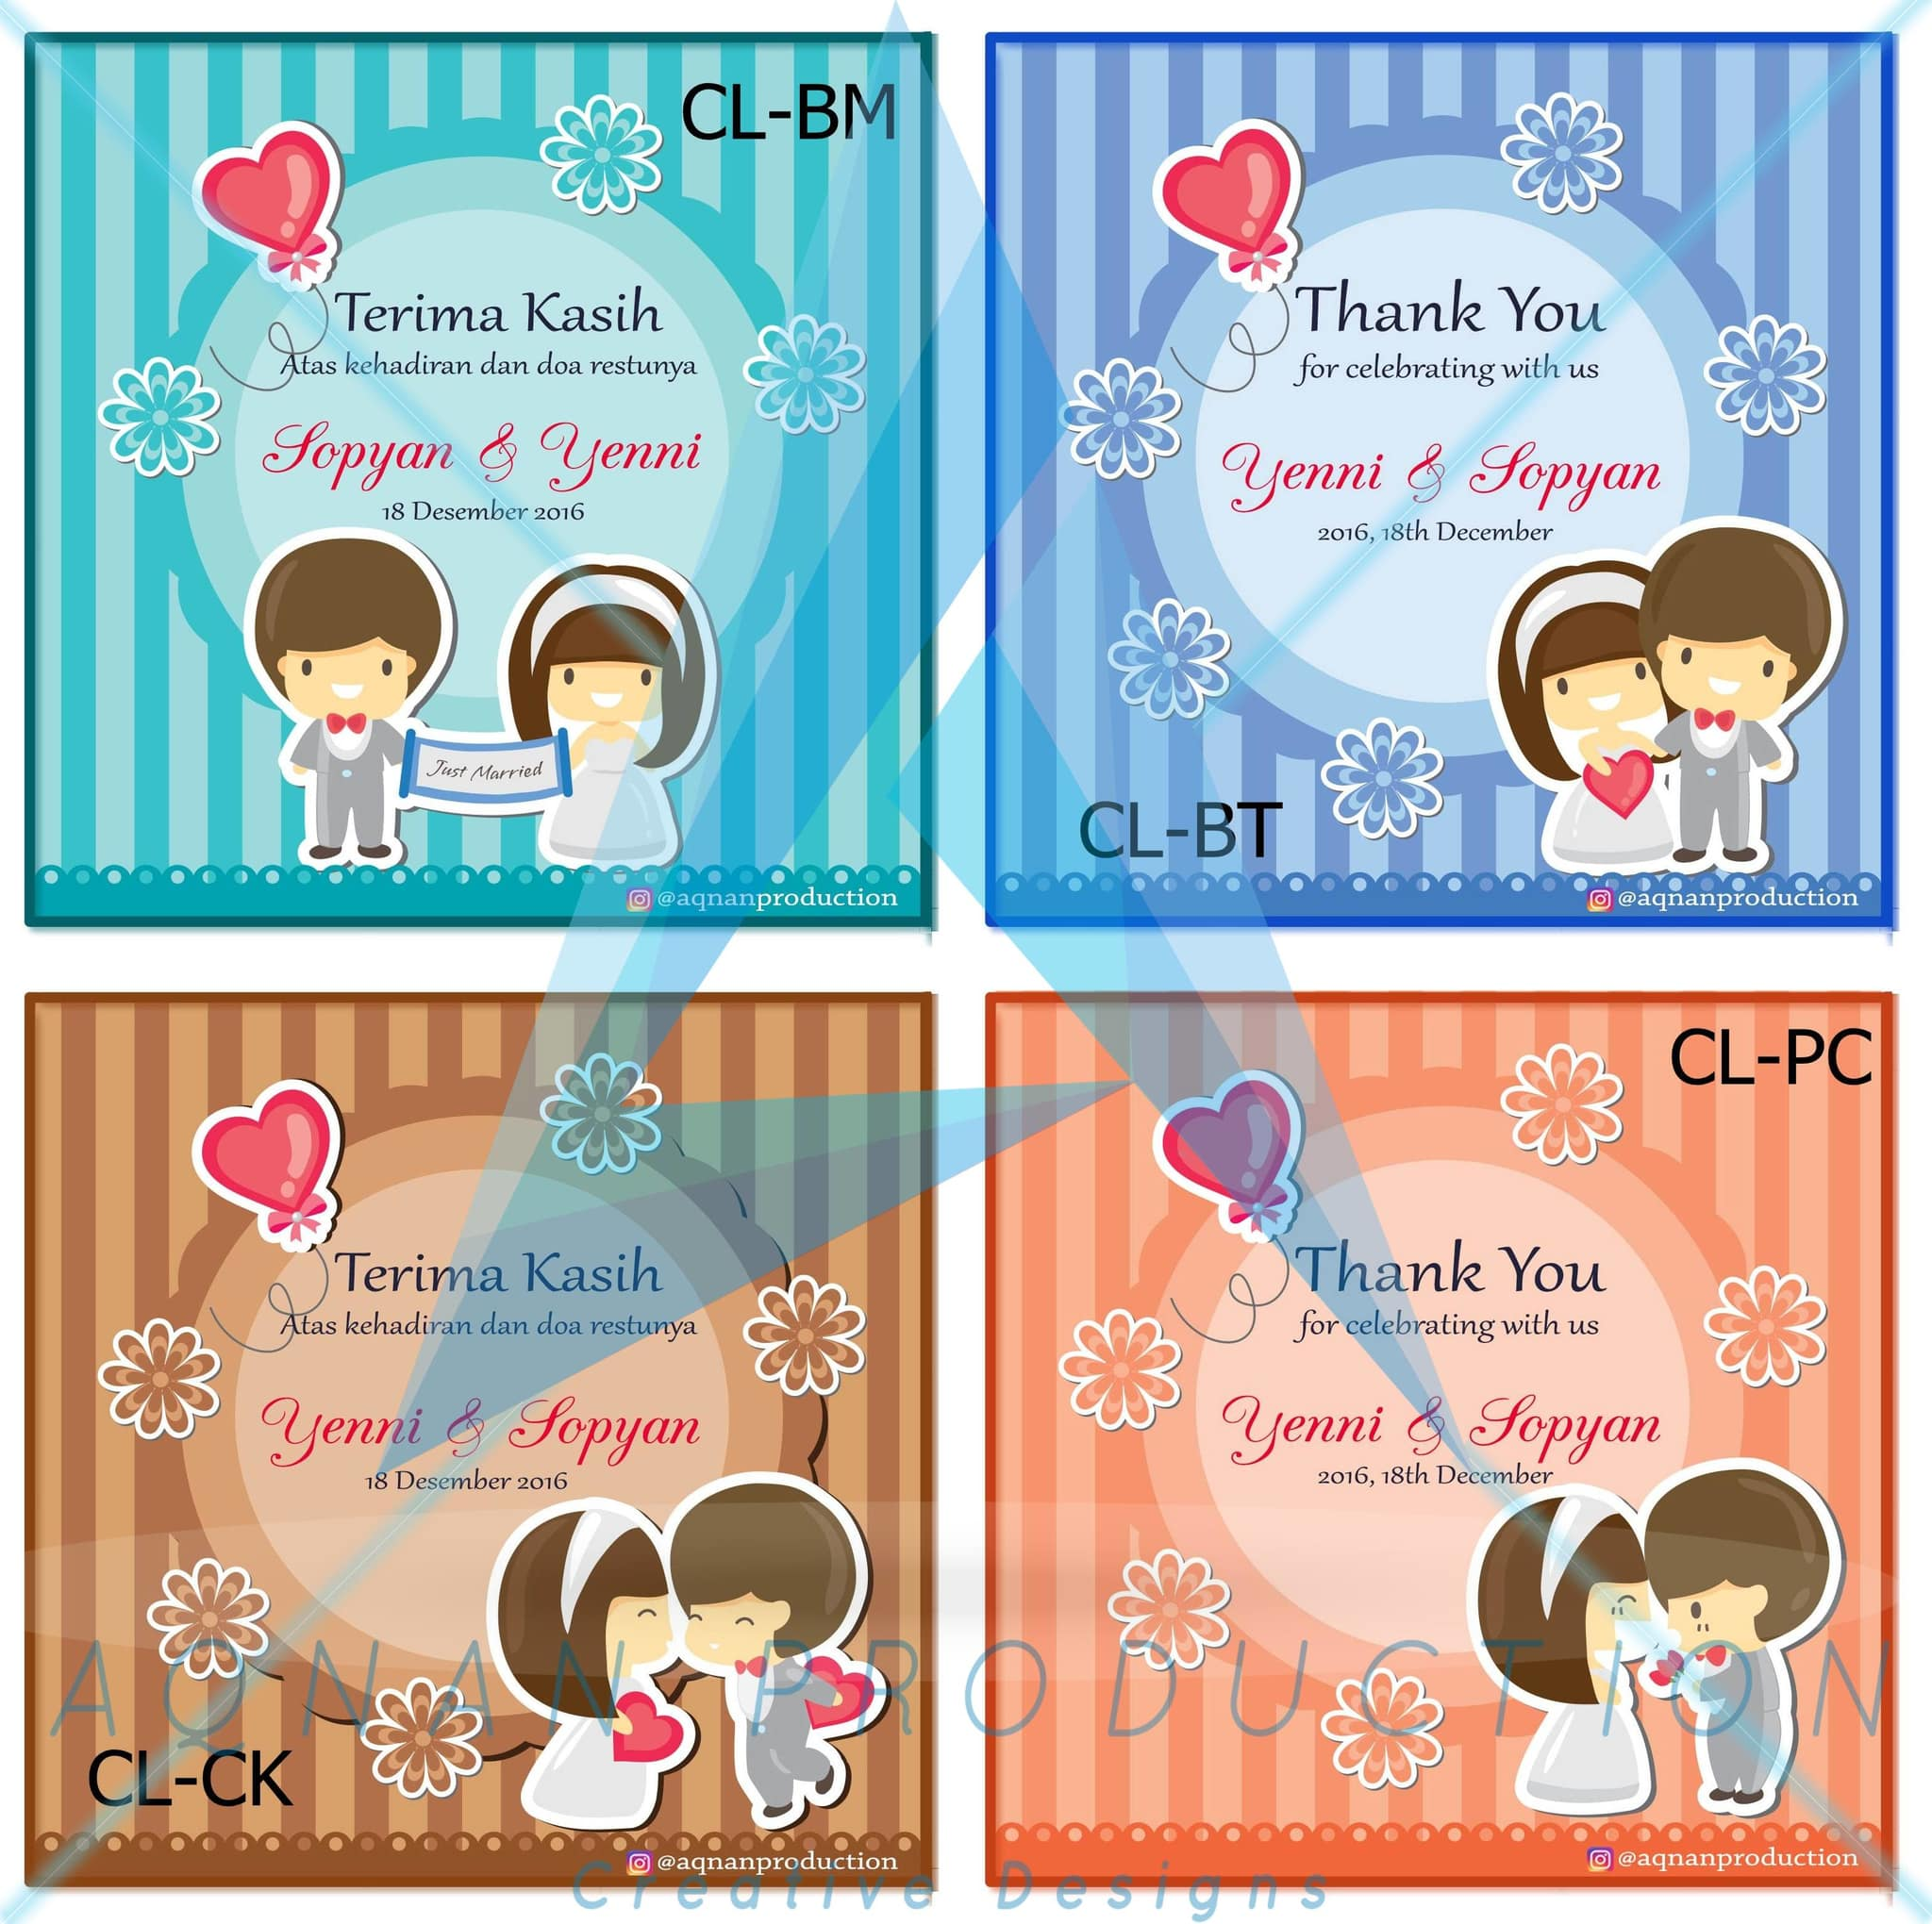 Jual Kartu Ucapan Terima Kasih Souvenir Pernikahan Wedding Thanks Kupon 18 Card A Double S House Tokopedia